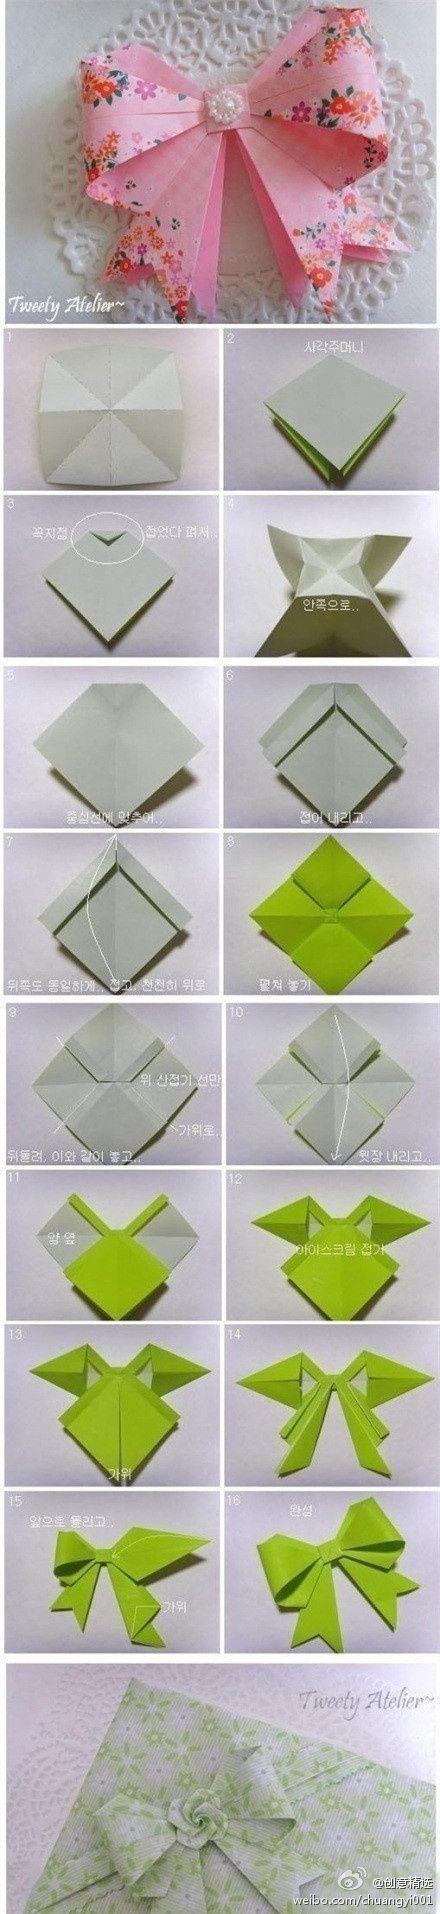 ribbon by Errikos Artdesign